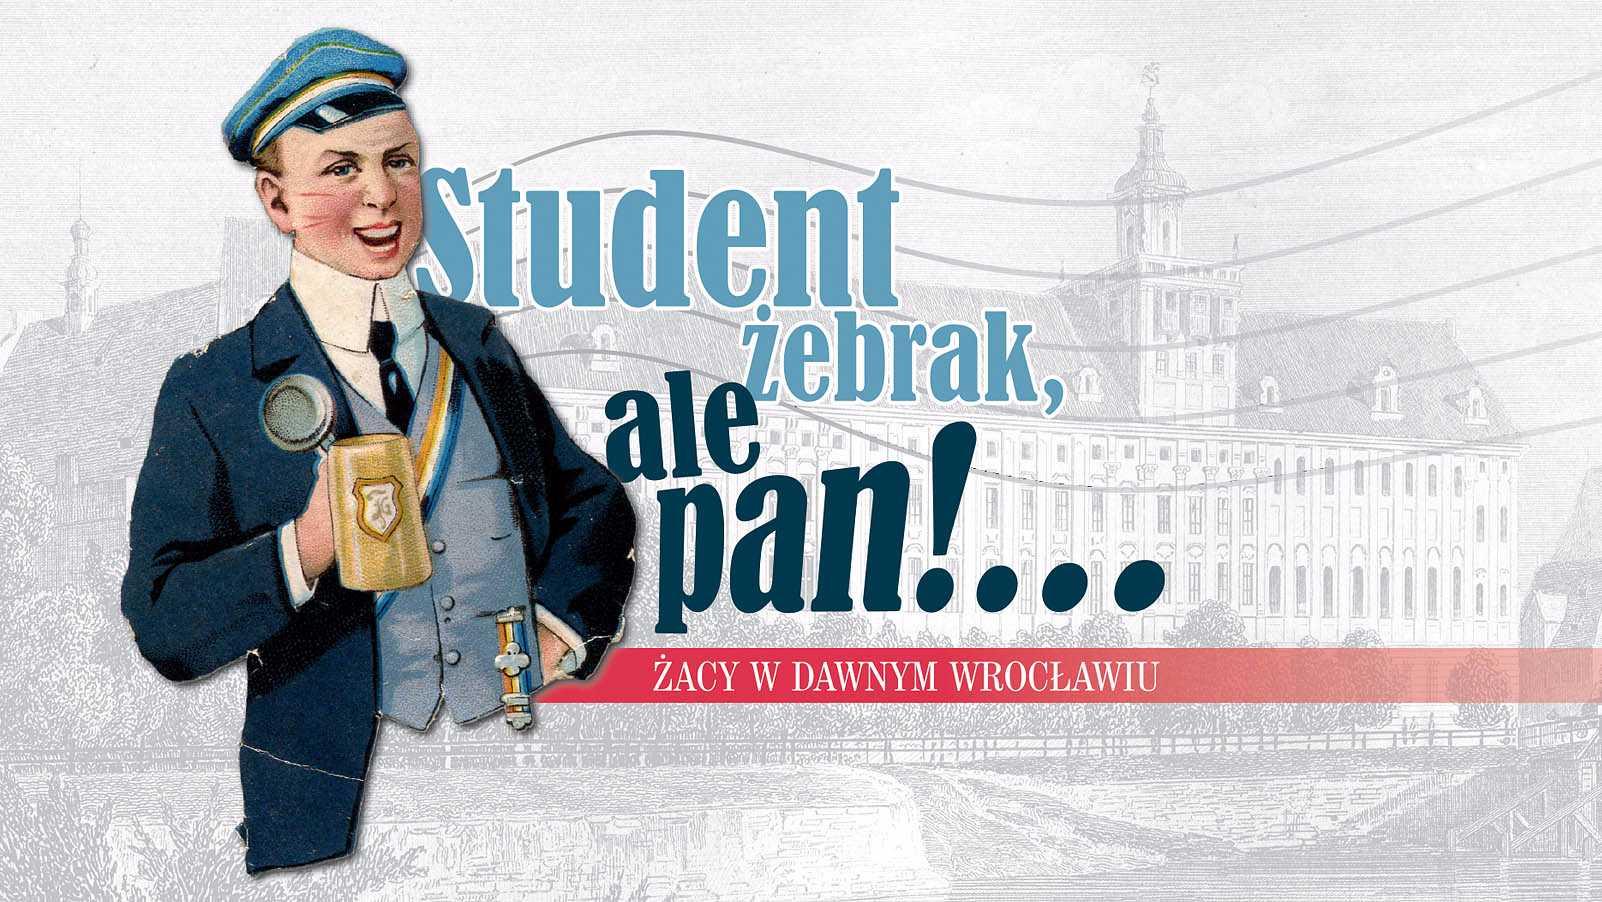 Student_winieta